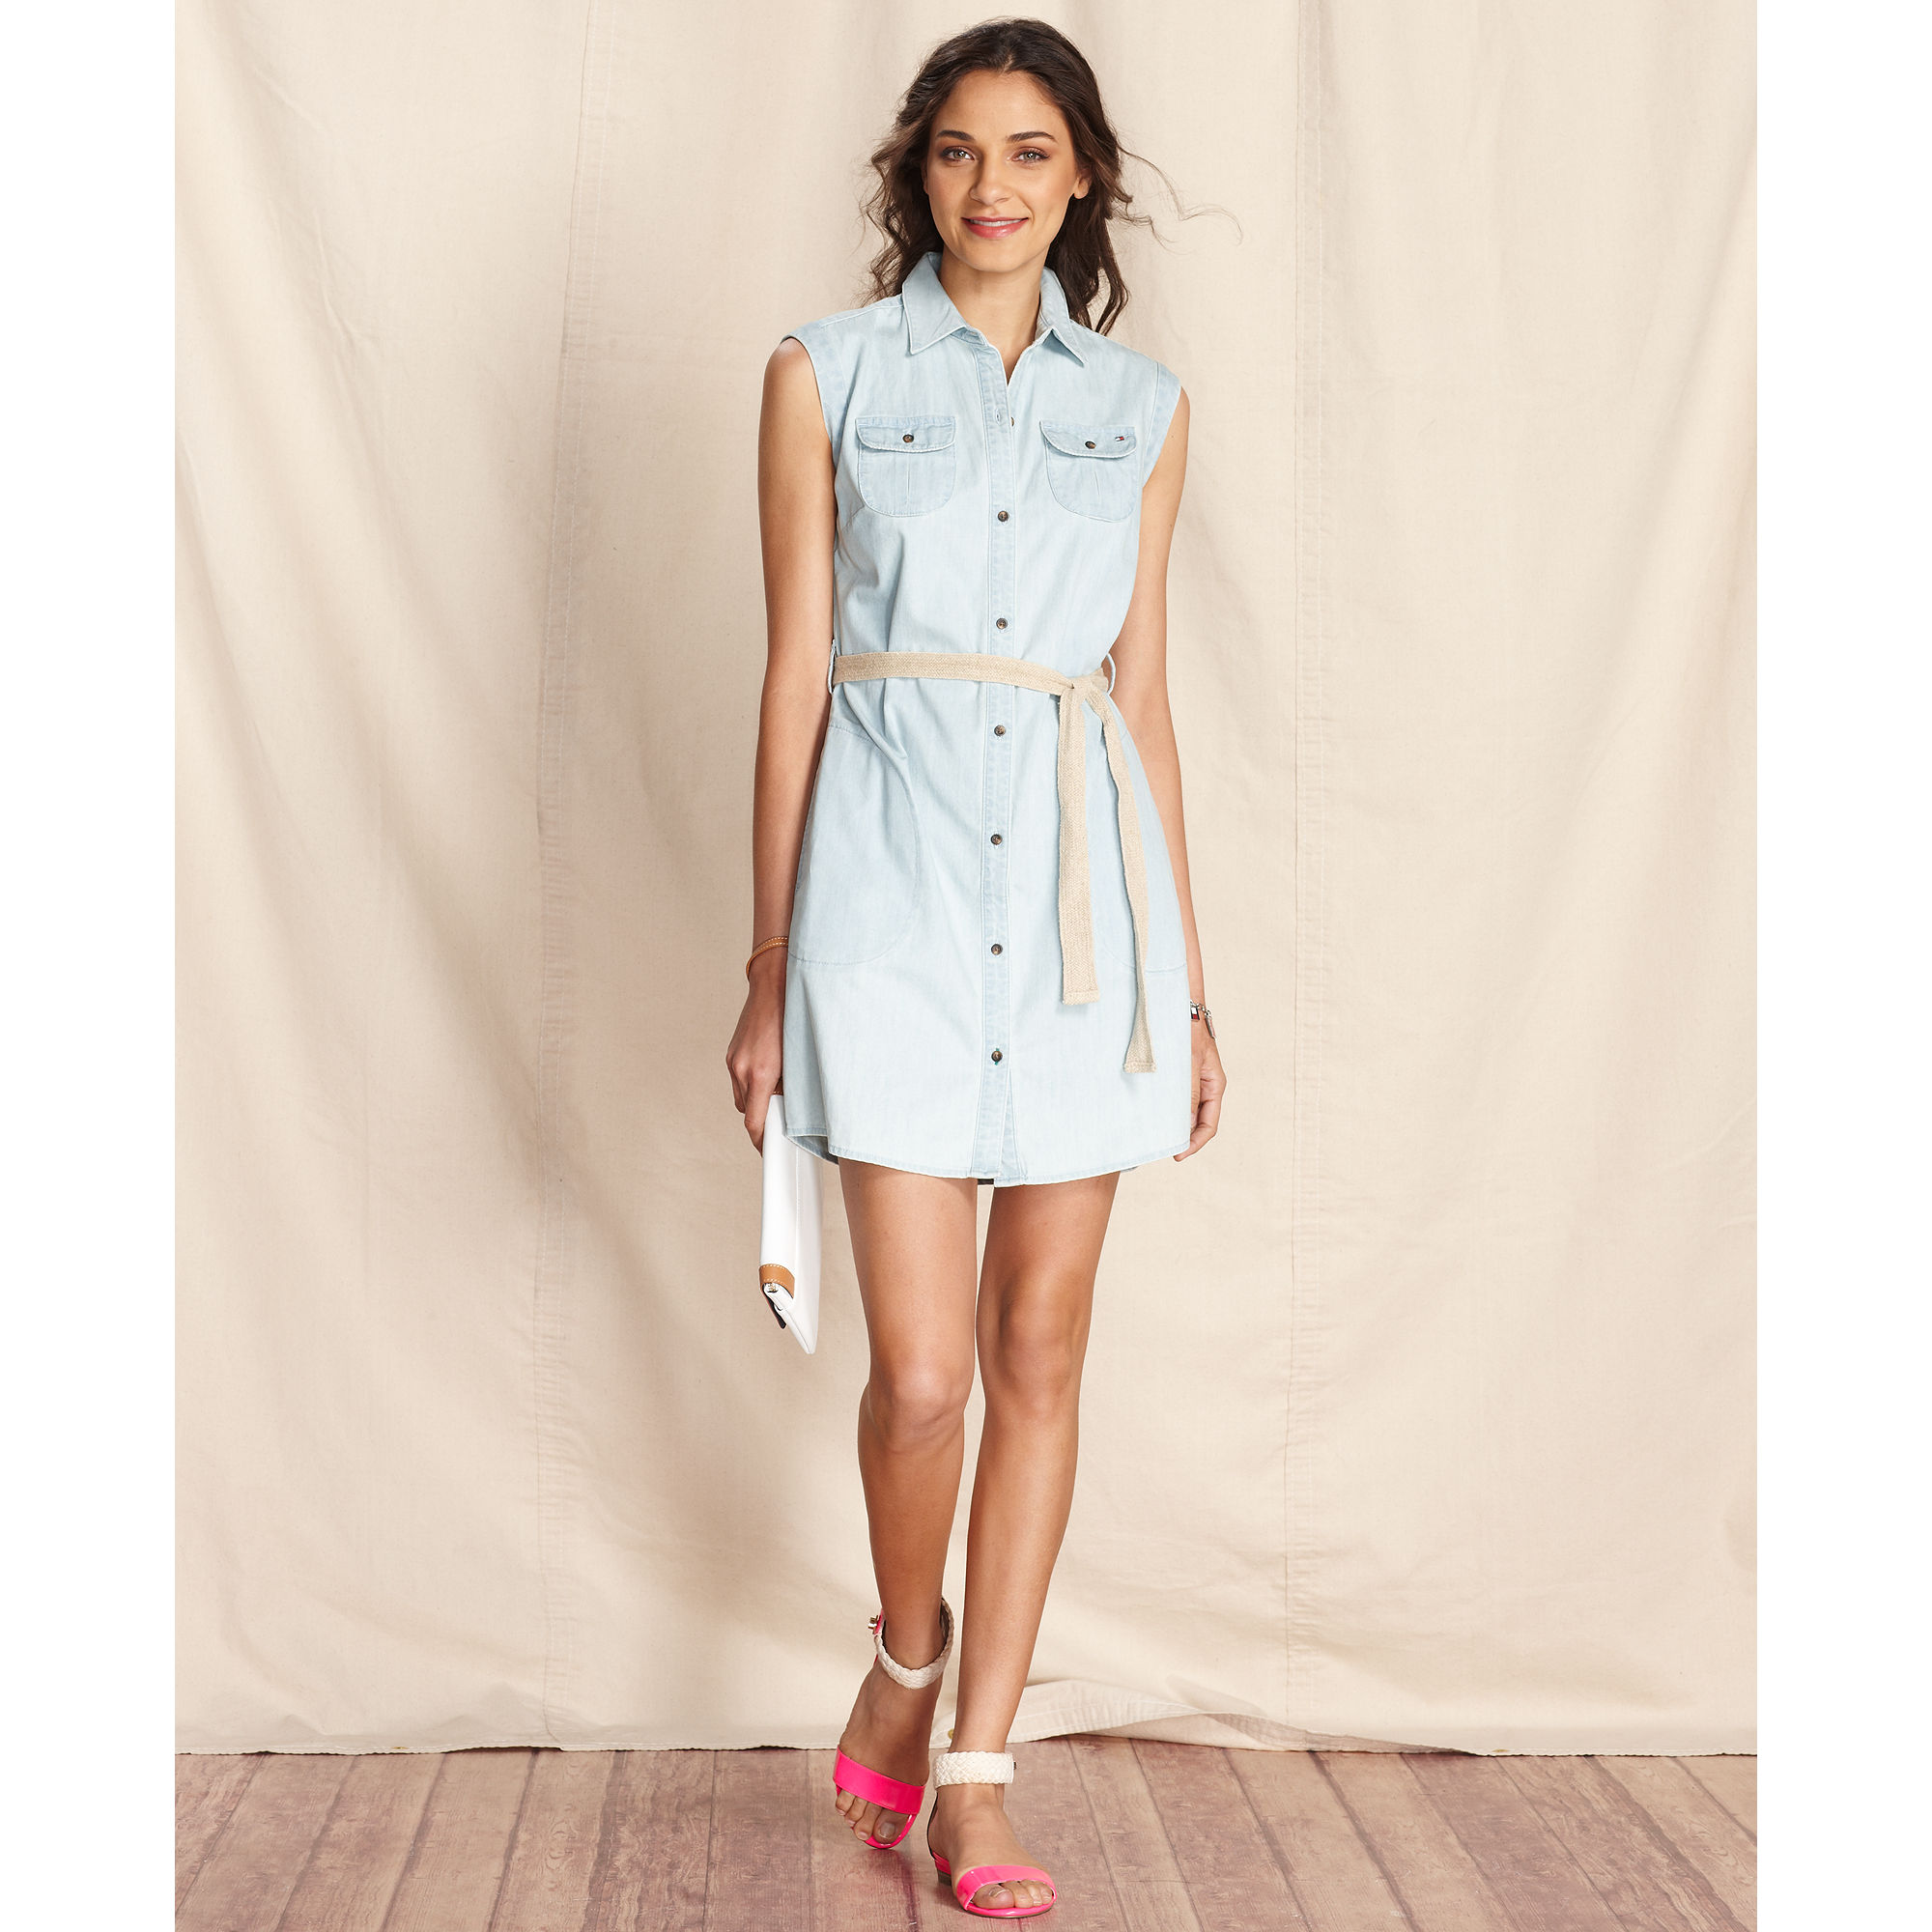 4a7c366a42e185 Lyst - Tommy Hilfiger Sleeveless Denim Shirtdress in Blue